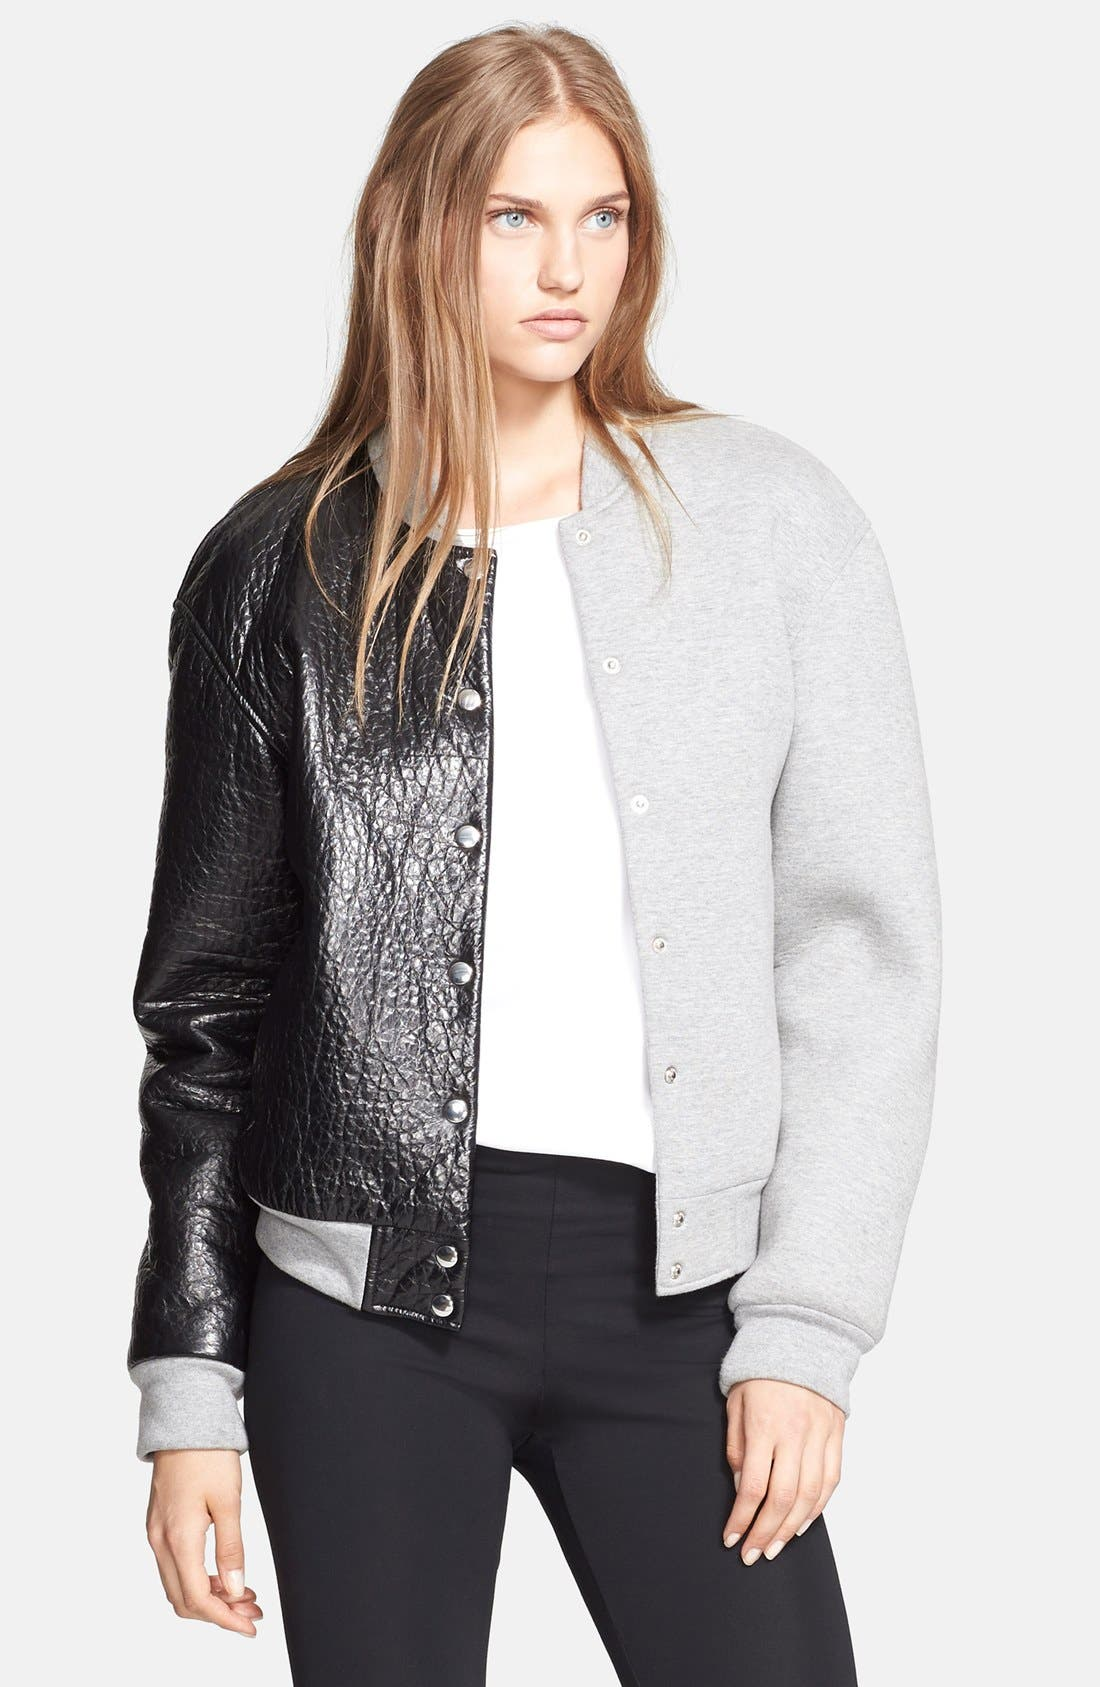 Alternate Image 1 Selected - T by Alexander Wang Leather & Neoprene Varsity Jacket